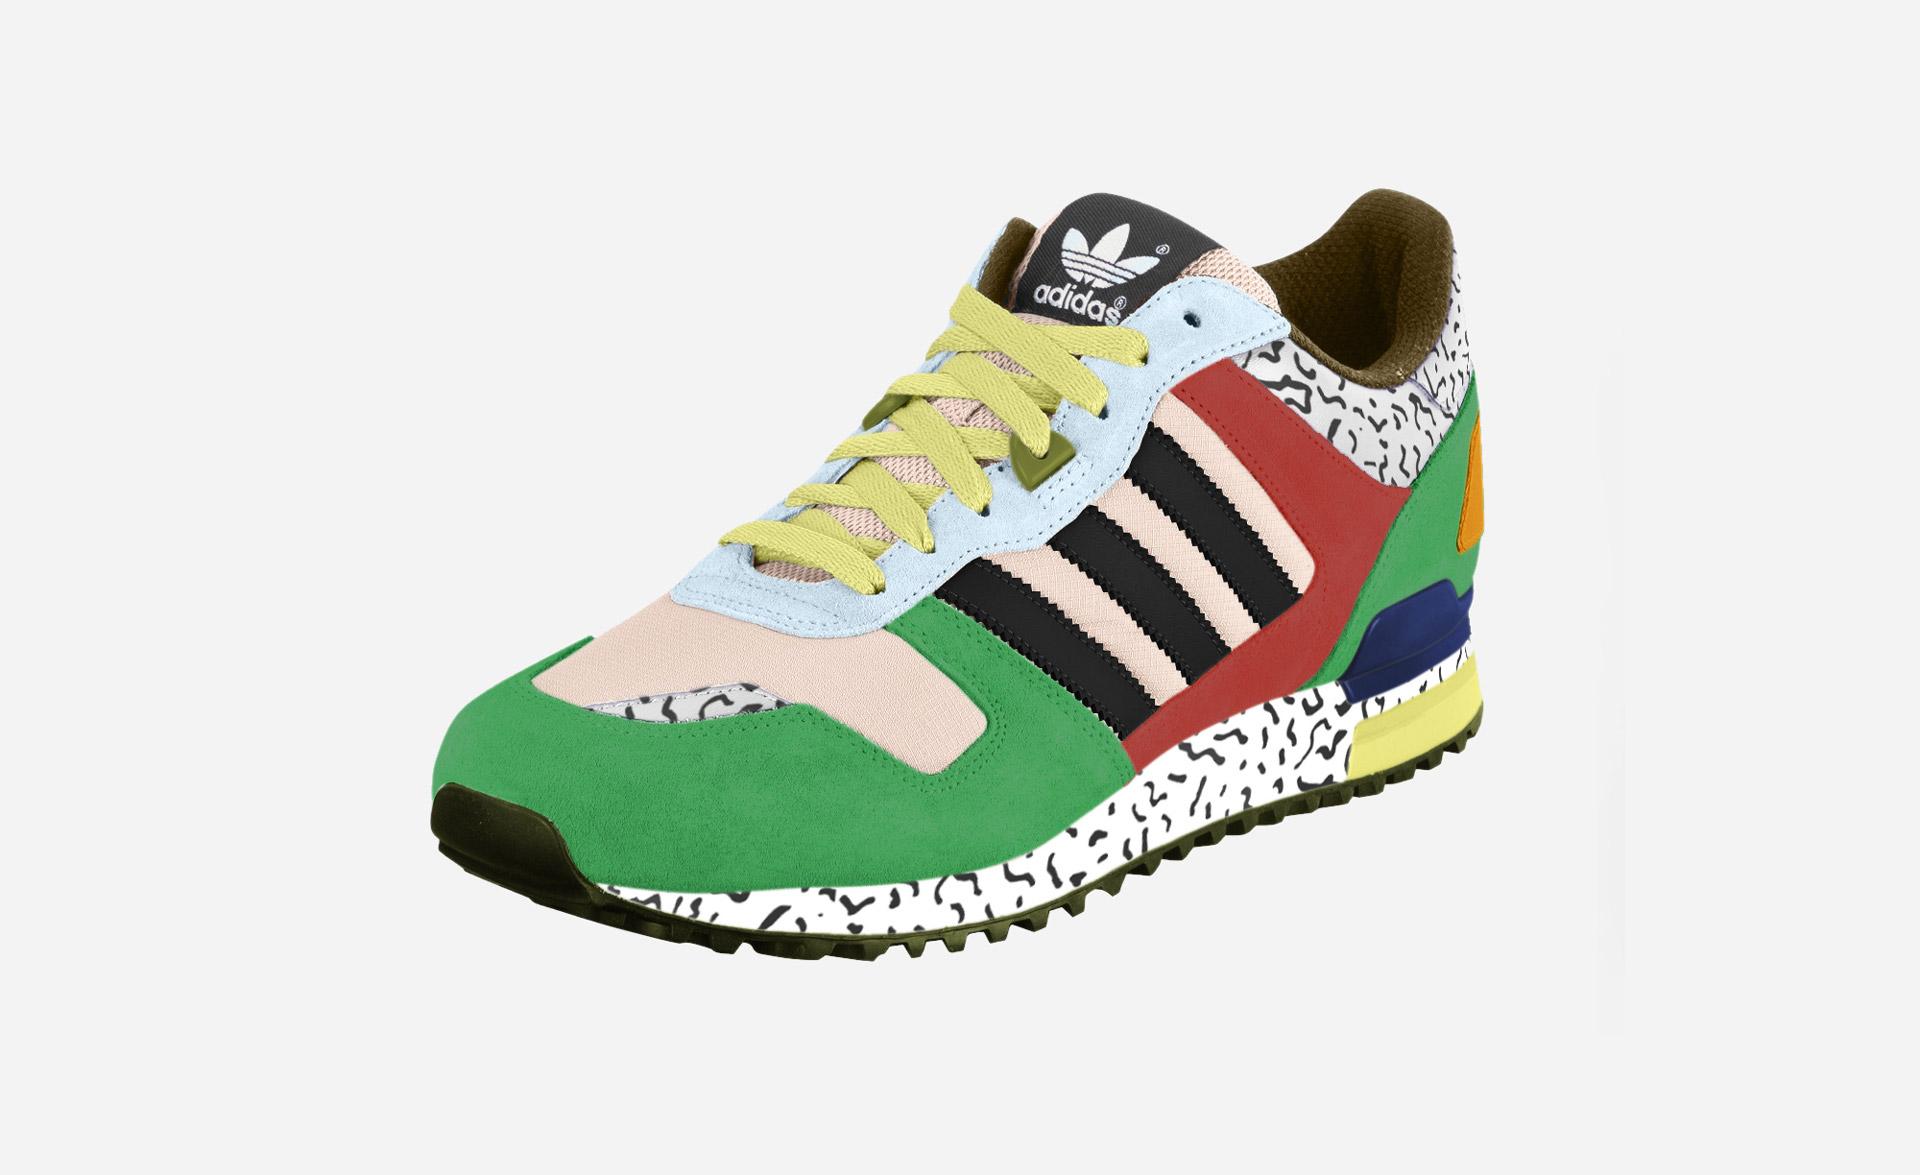 Tino Seubert - Ettore Sottsass Sneaker - Adidas